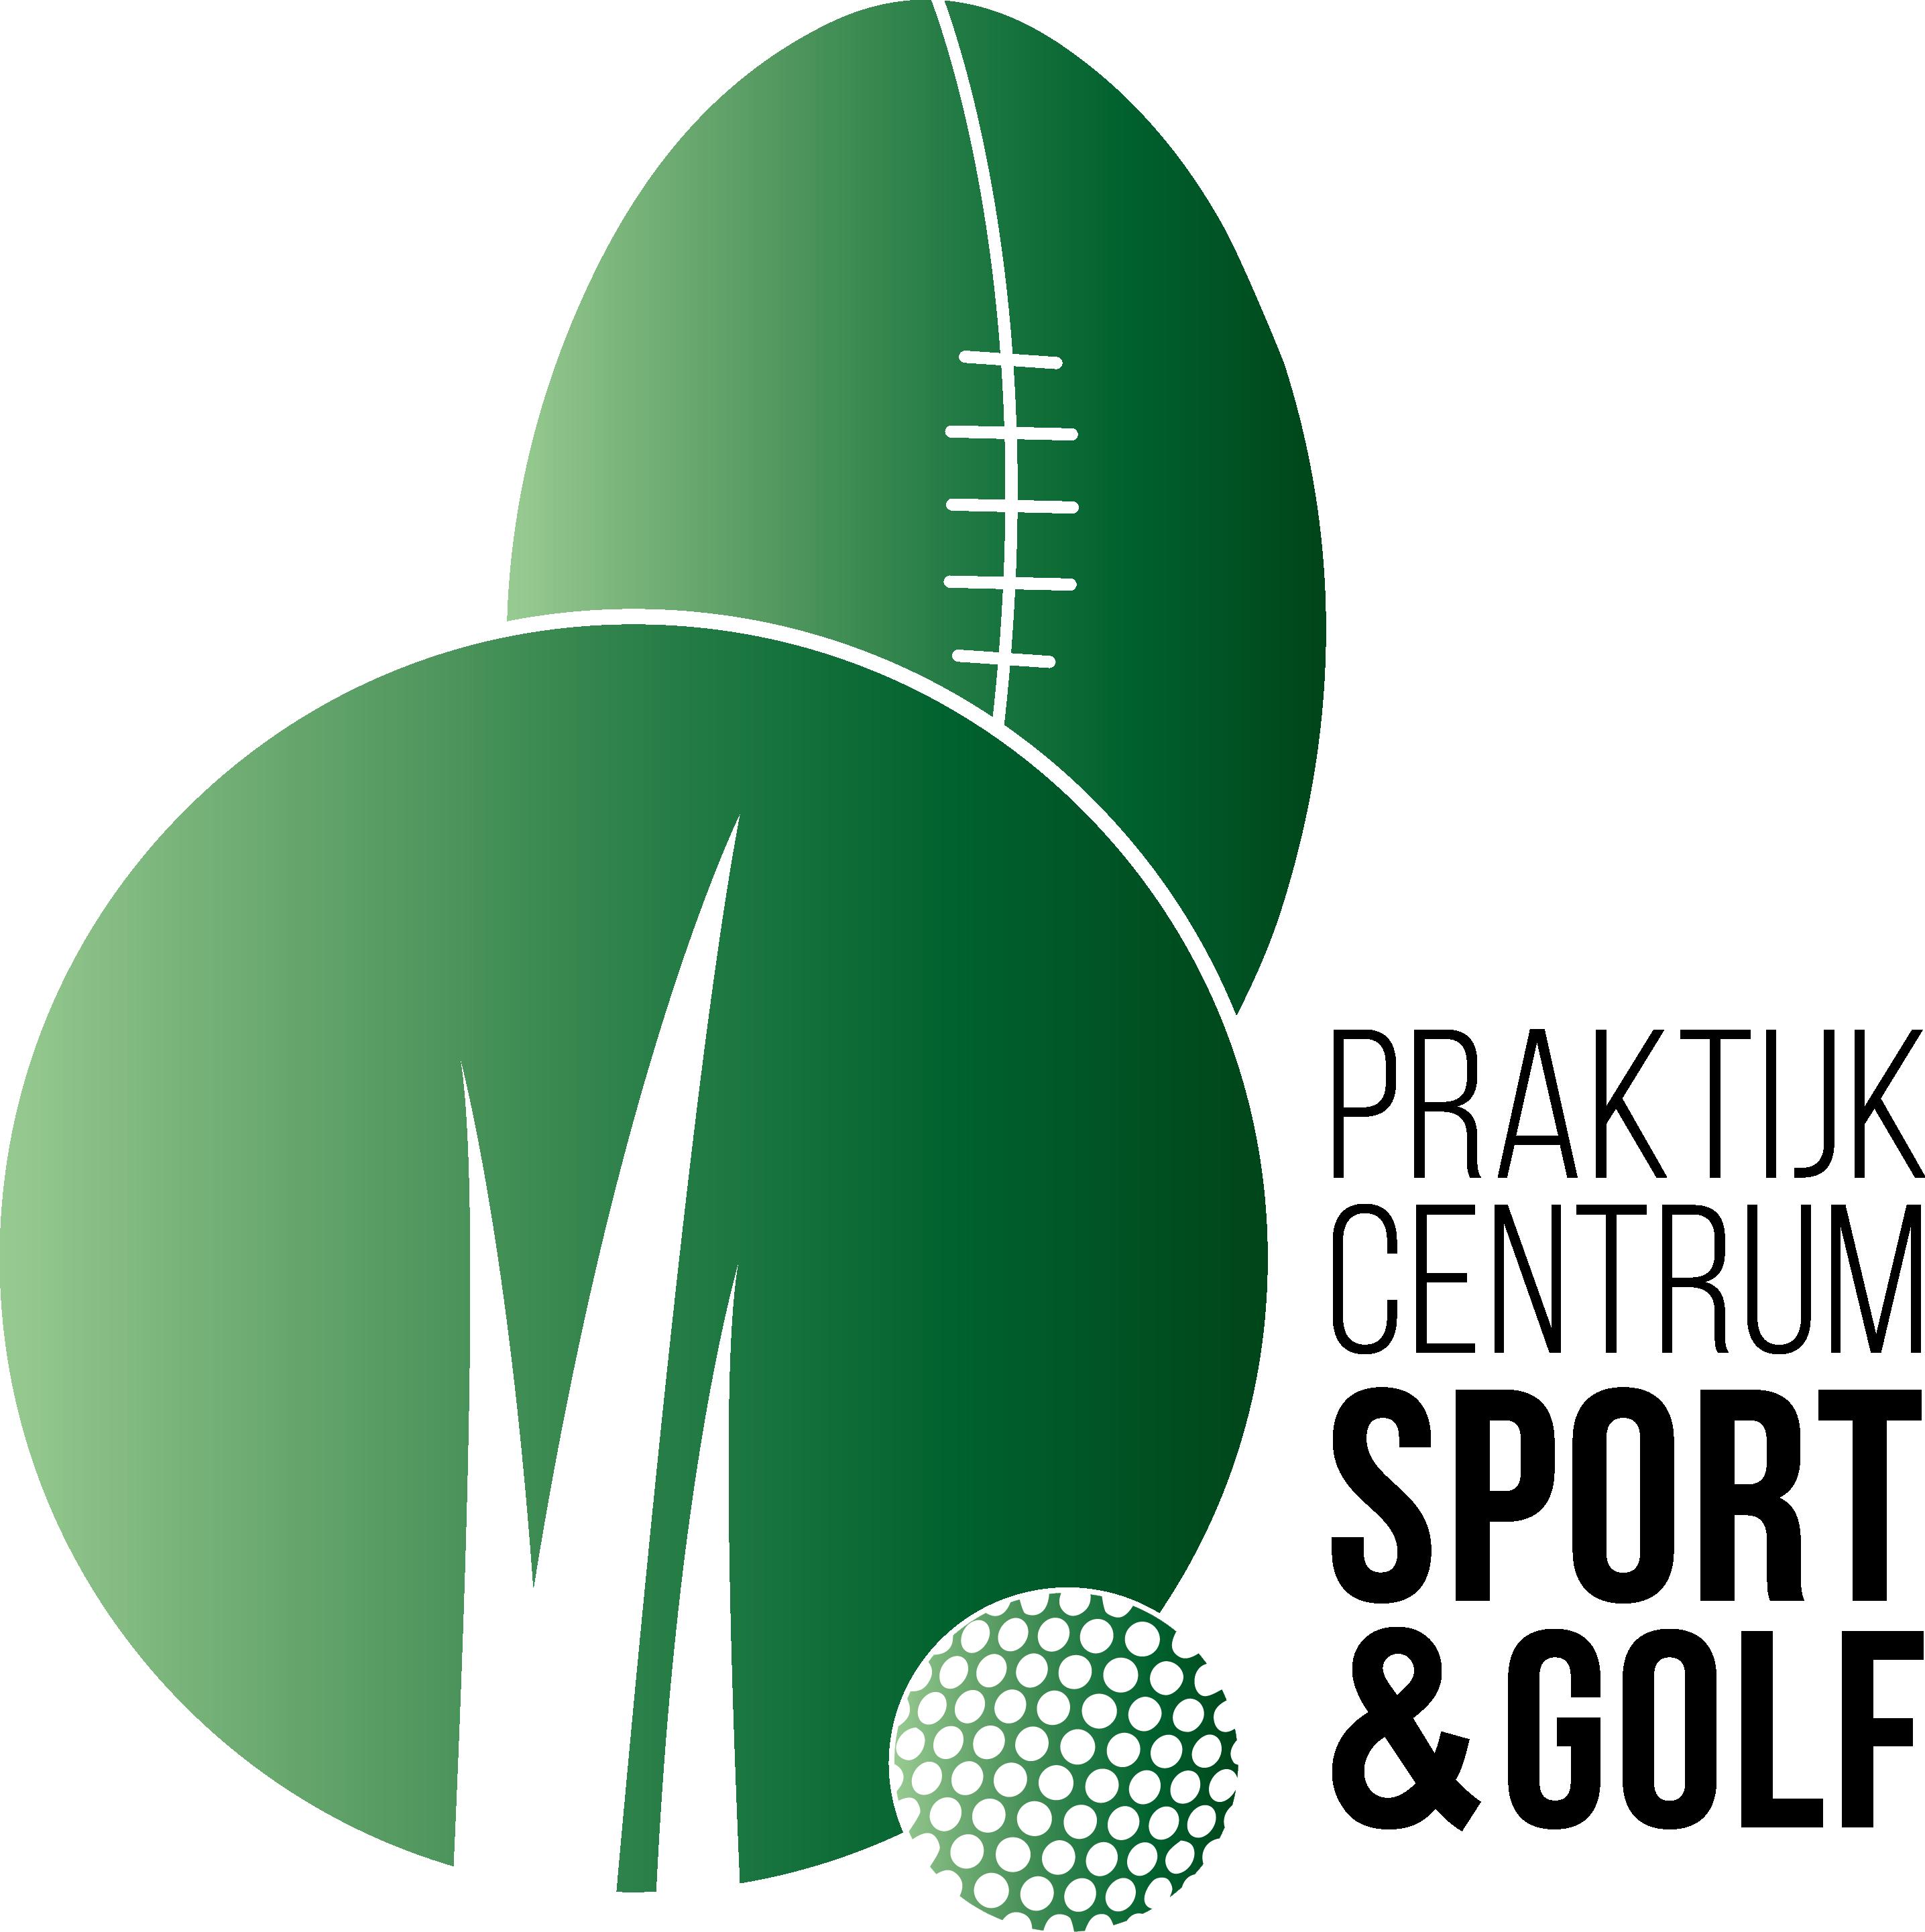 Praktijk Centrum Sport & Golf